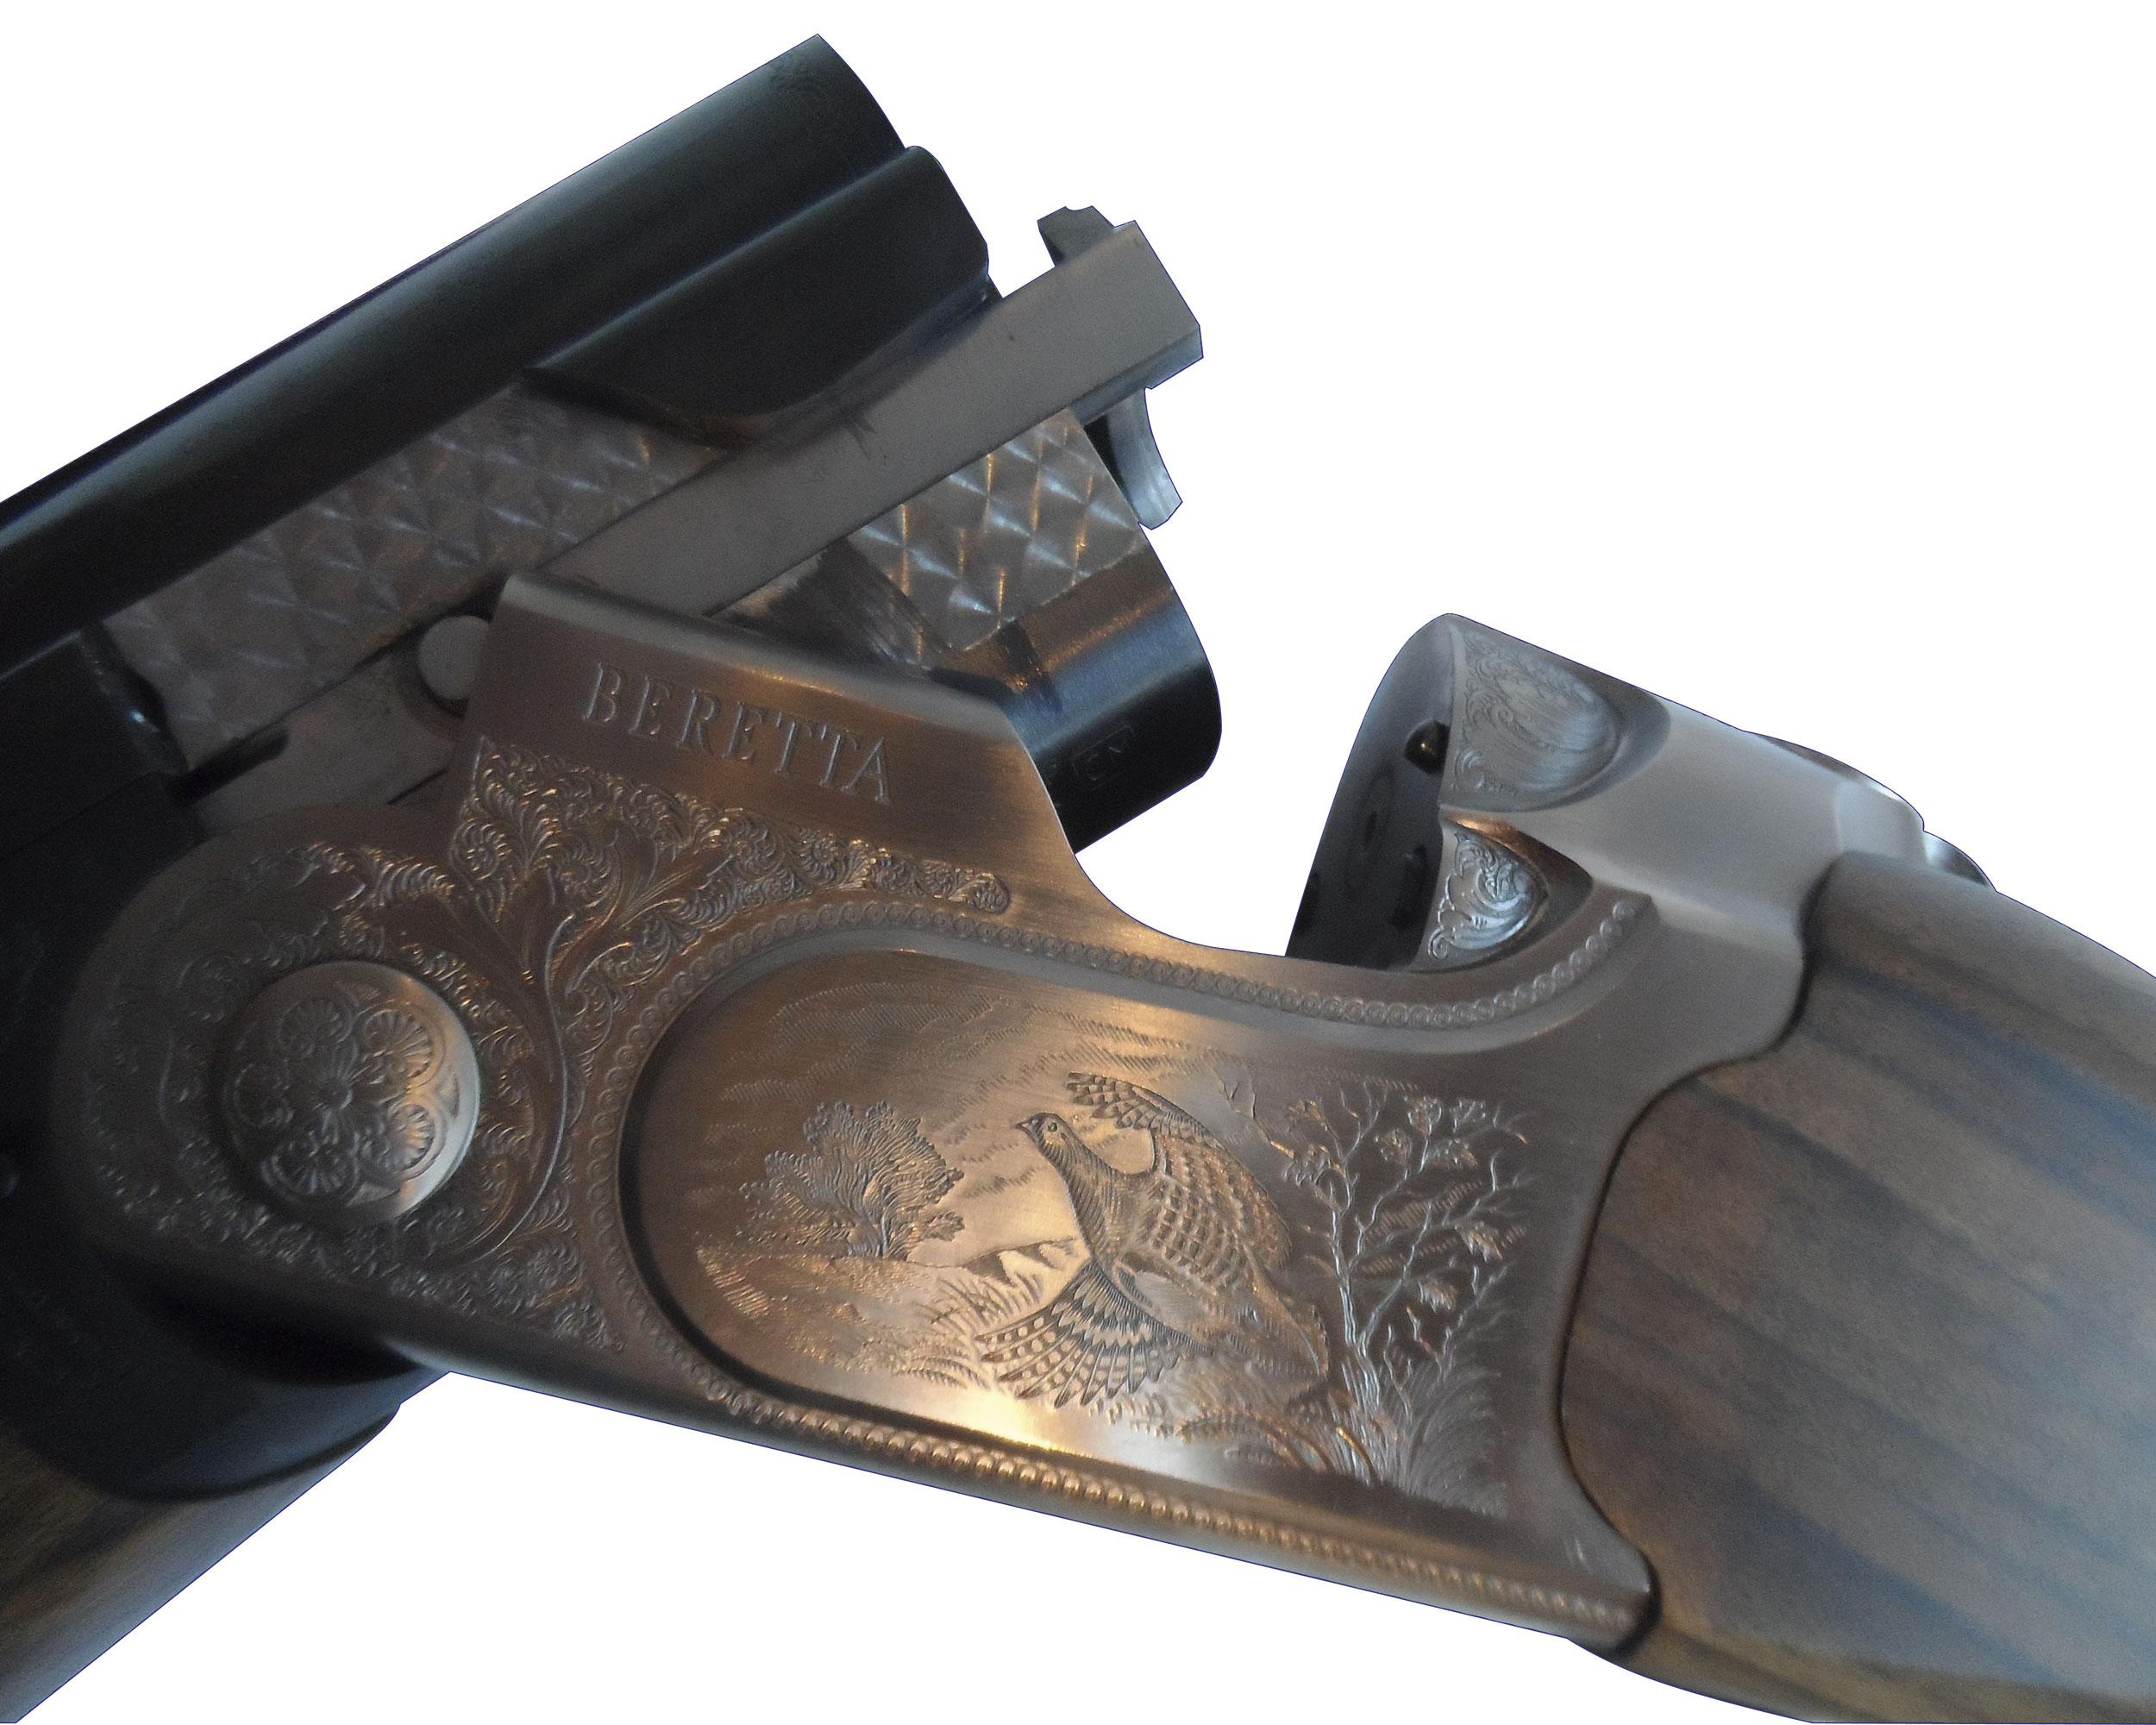 Beretta 690 Field III shotgun review